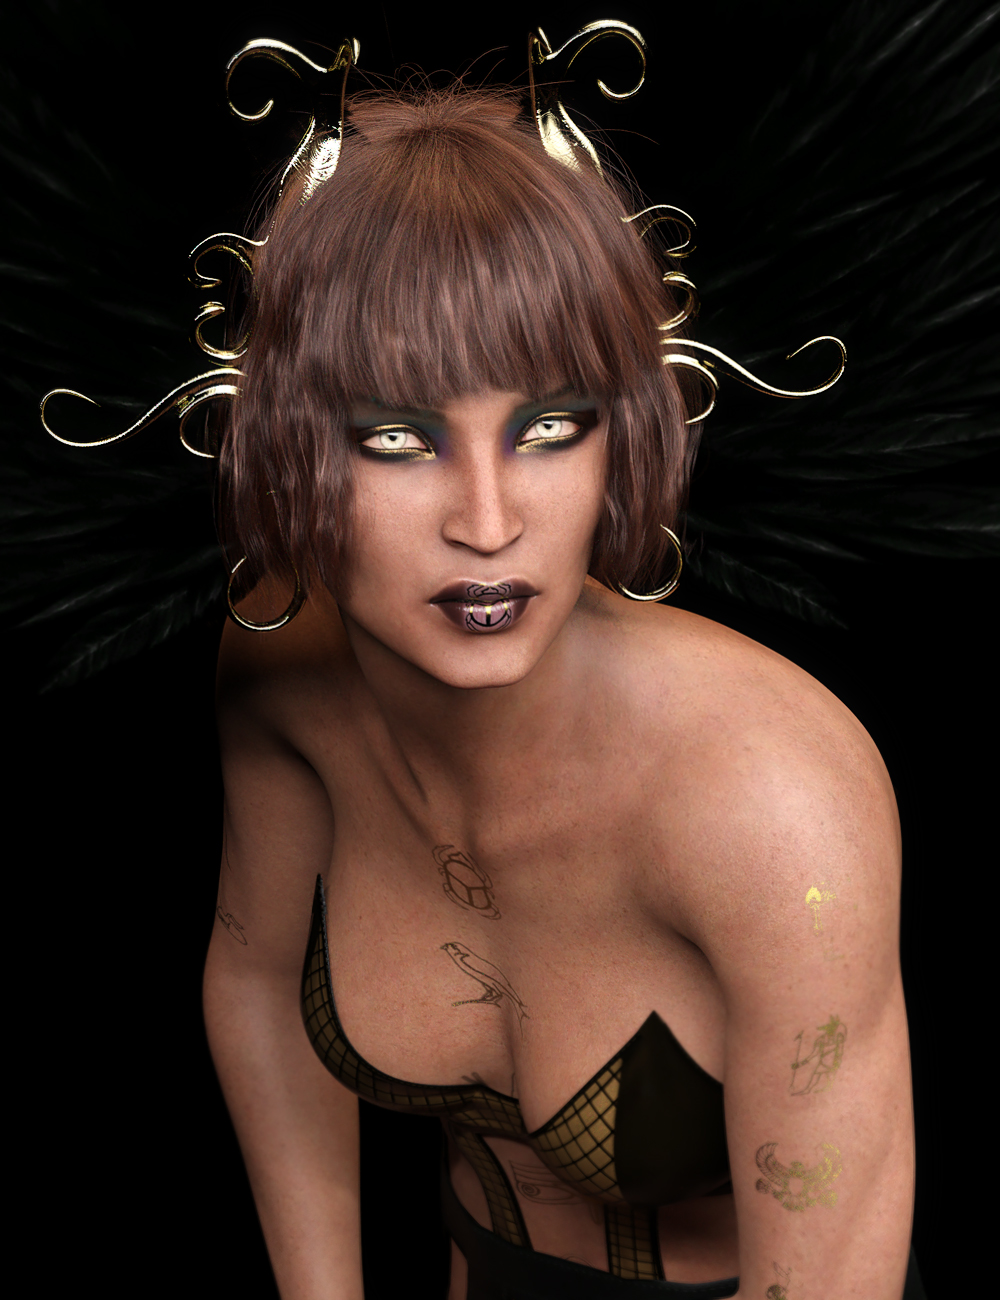 Mst Panya for Genesis 8 Female and Khemsit 8 by: Mstene, 3D Models by Daz 3D